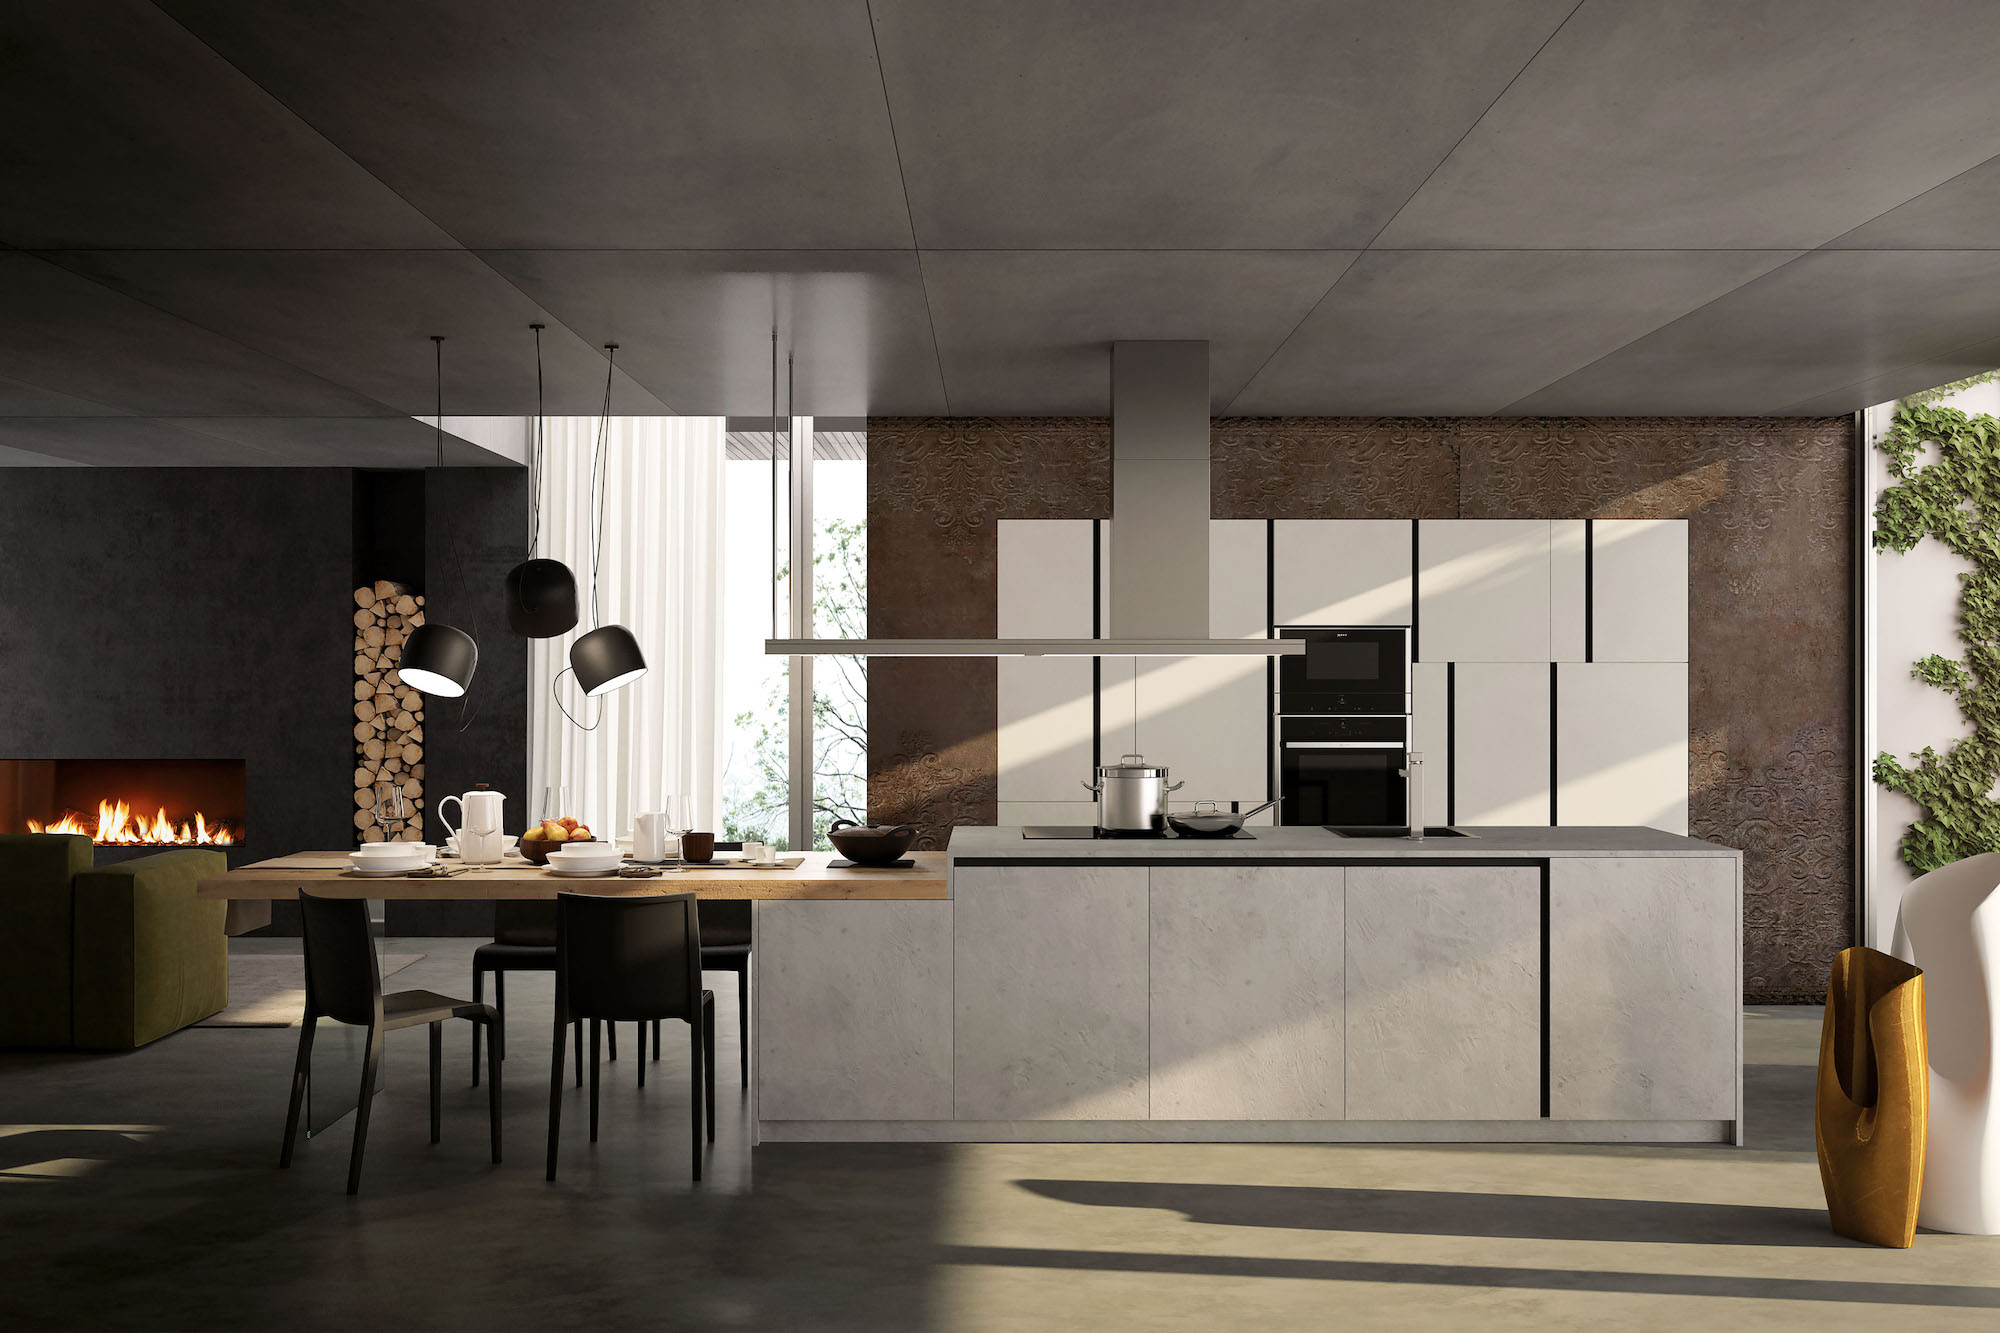 lombardo arredi cucine camerette arredo giardino mobili